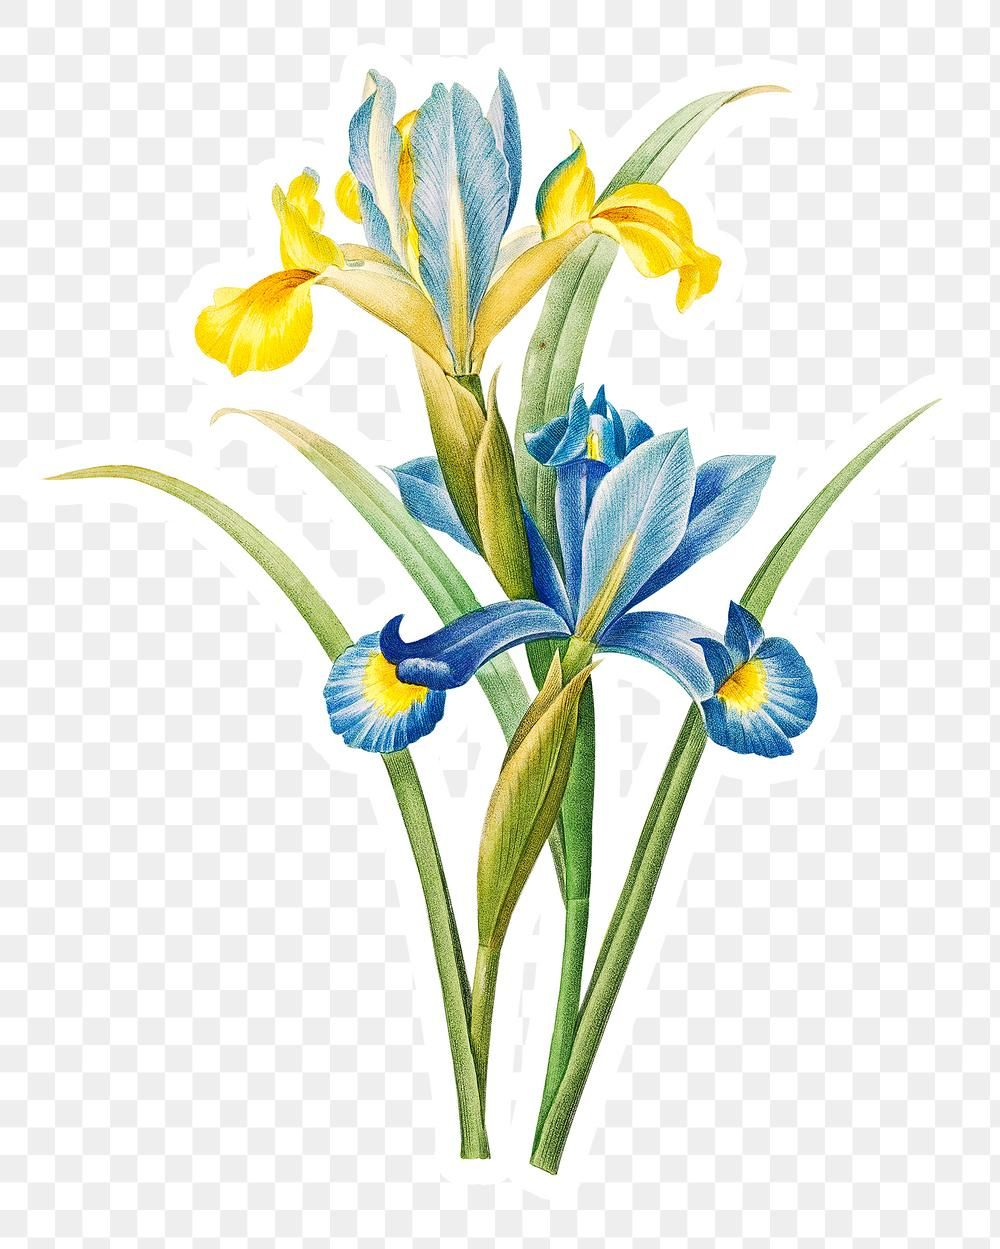 Iris Flower Sticker Overlay Design Element Free Image By Rawpixel Com Iris Flowers Watercolor Flowers Design Element